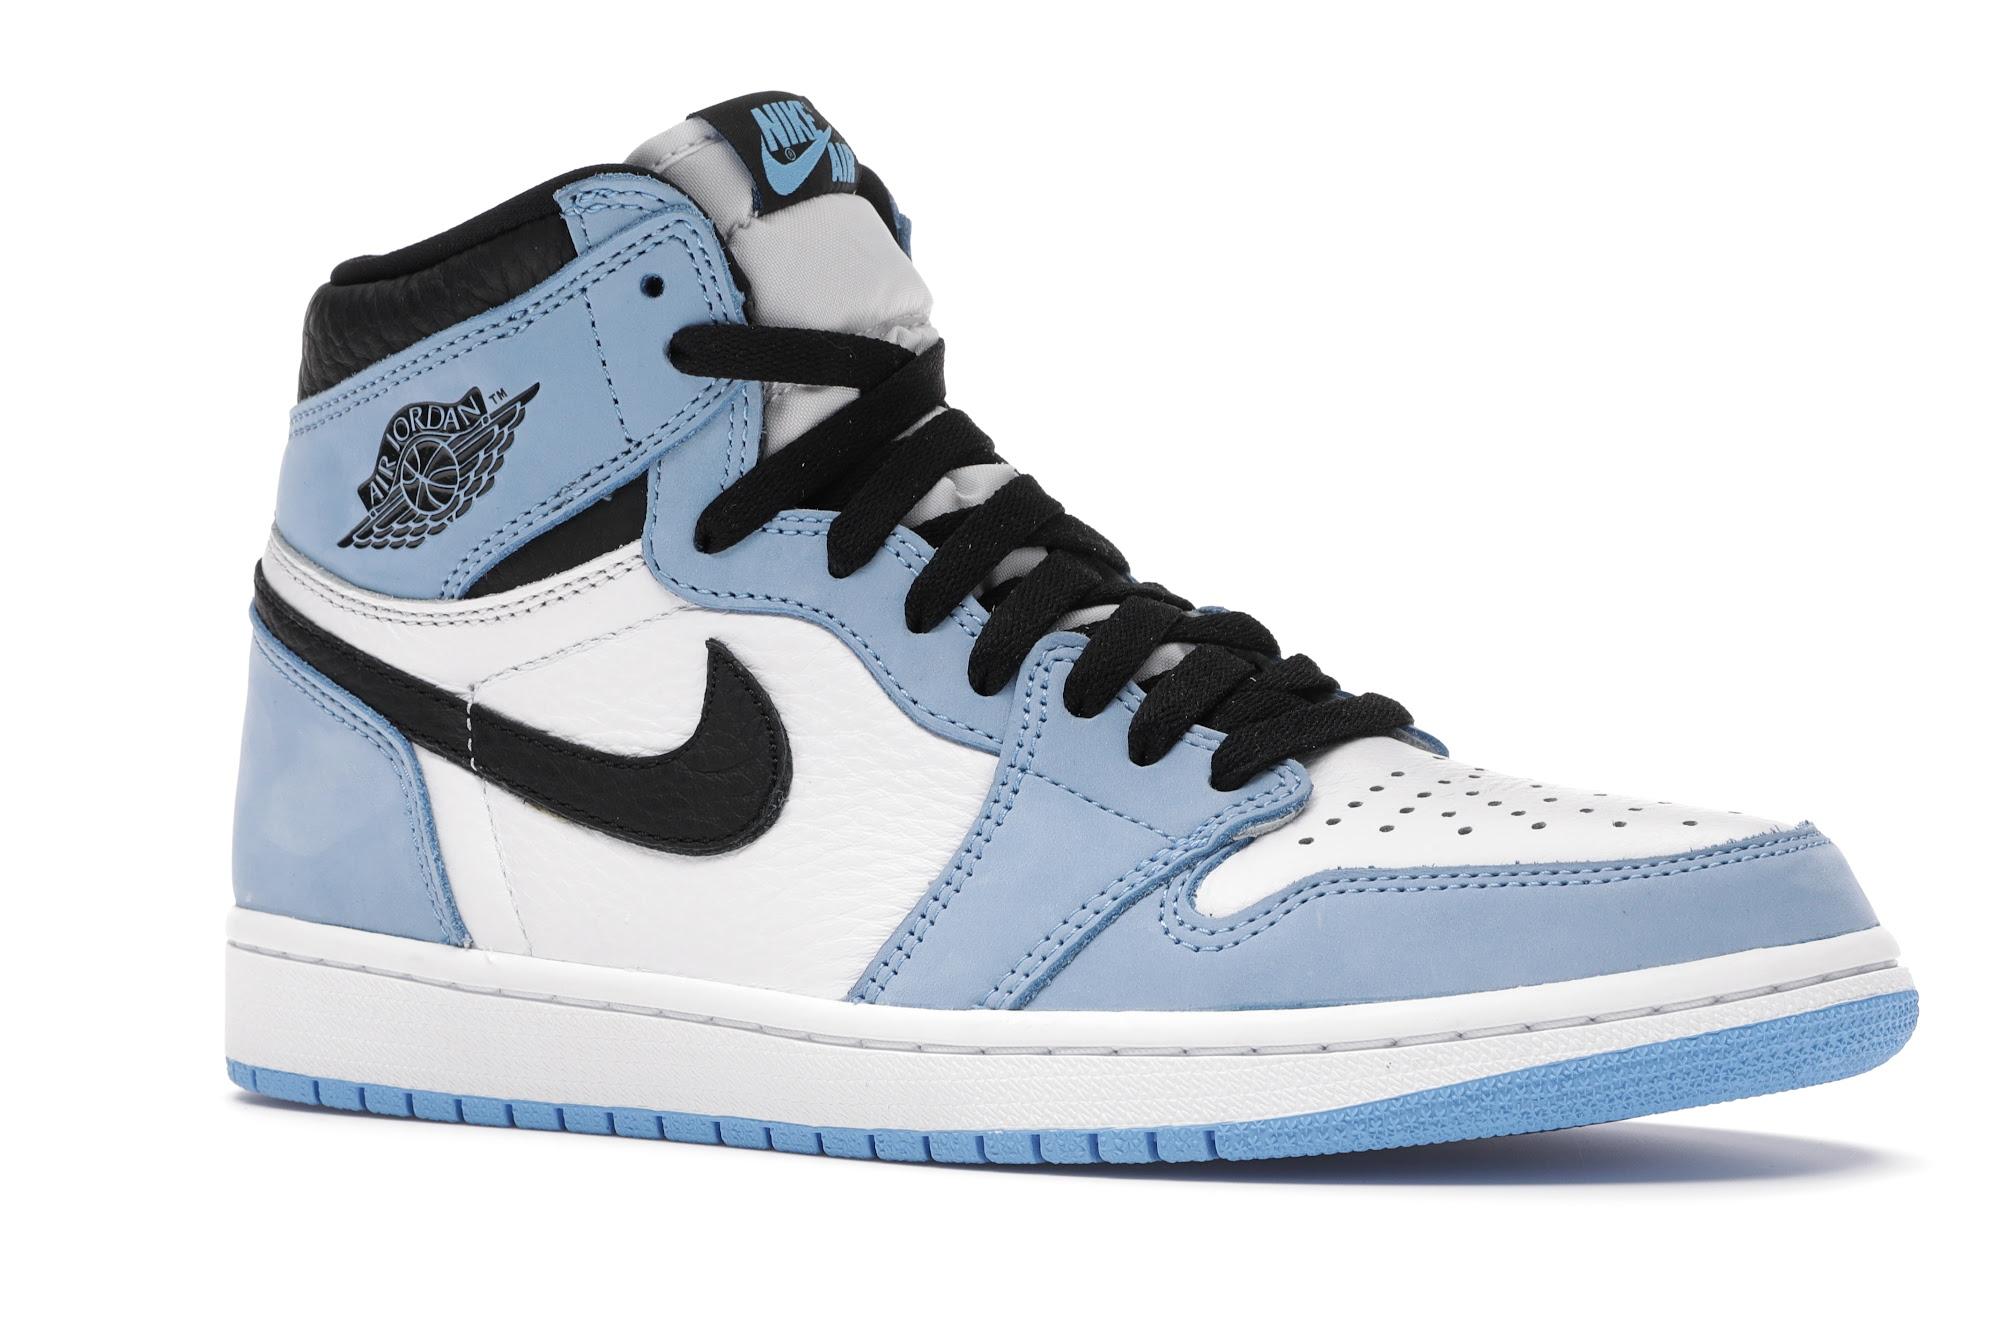 Jordan 1 Retro High White University Blue Black - 555088-134